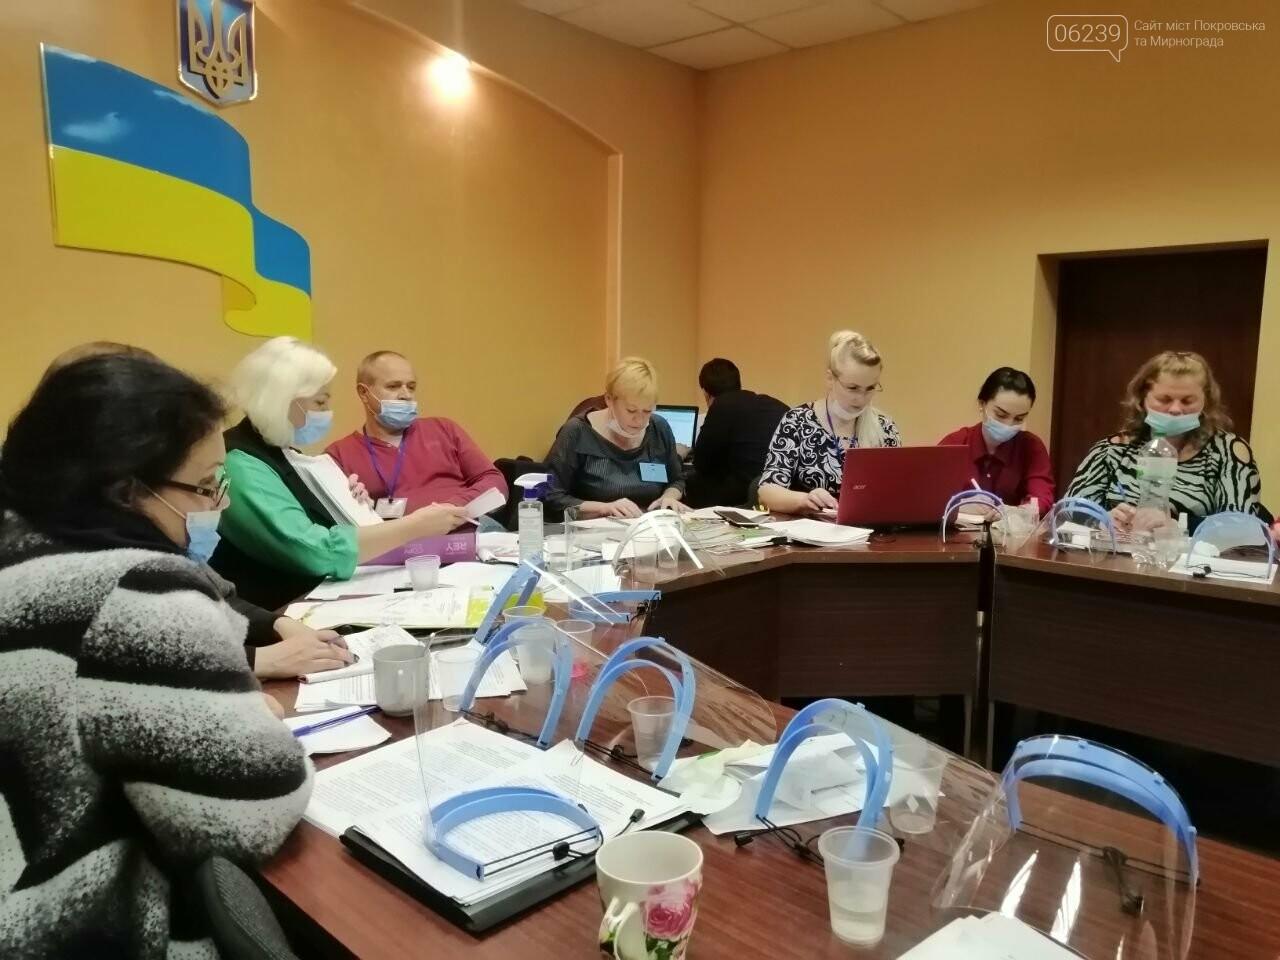 Мирноградская ТИК по состоянию на 18.00 получила бюллетени от 15 участков, фото-2